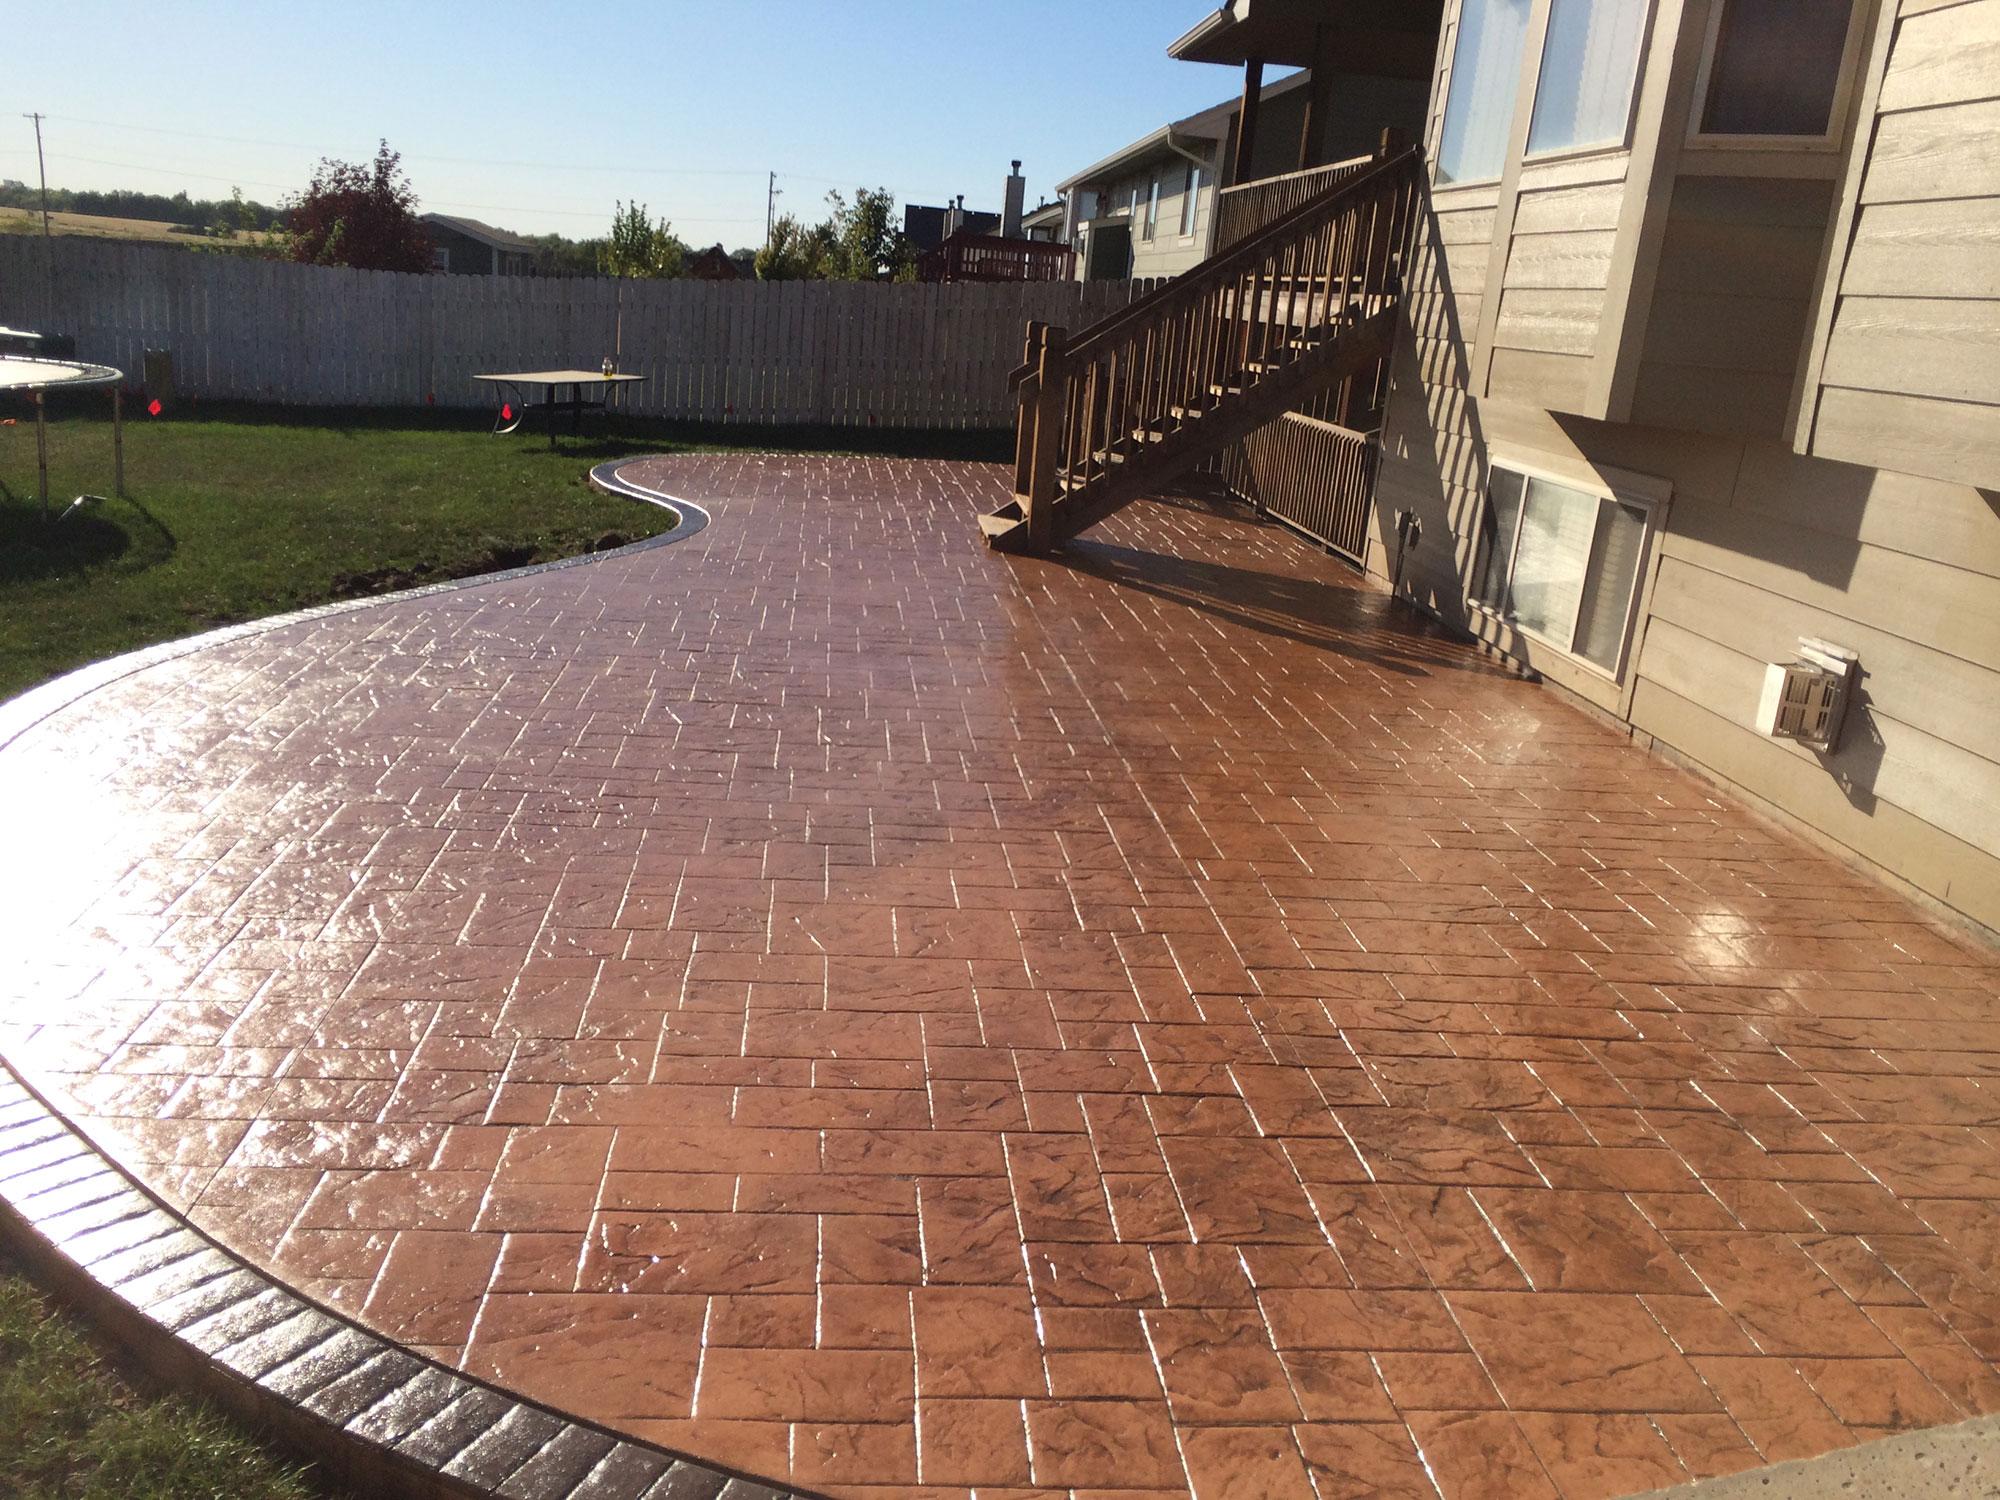 Stamped Concrete | Decorative Concrete | Colored Concrete ... on Cement Patio Ideas id=73297